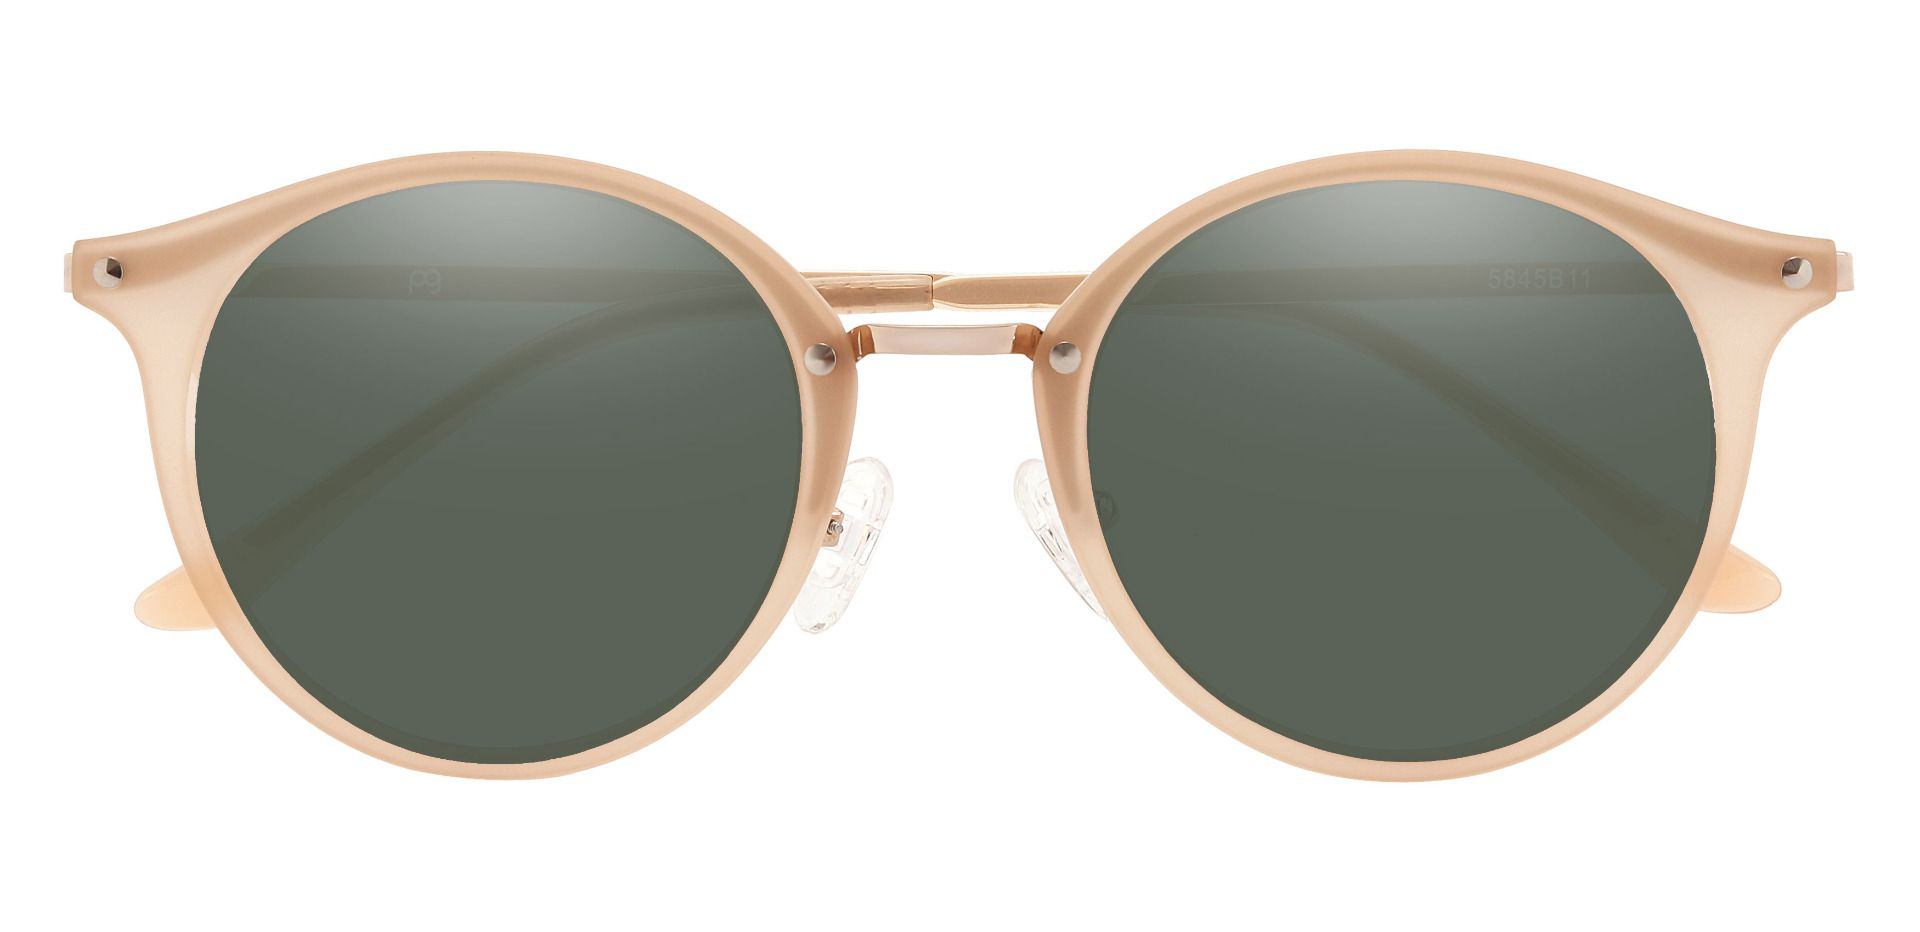 Biloxi Round Prescription Sunglasses - Brown Frame With Green Lenses